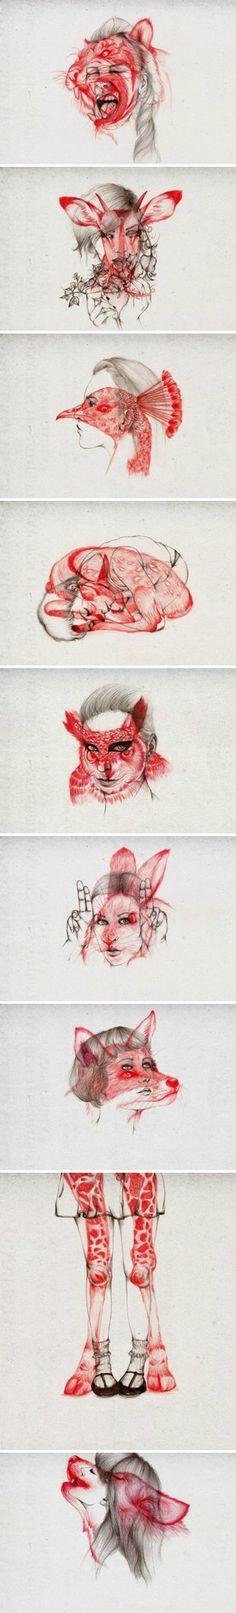 Peony Yip Animal Morphing Illustrations via - 堆糖 发现生活_收集美好_分享图片